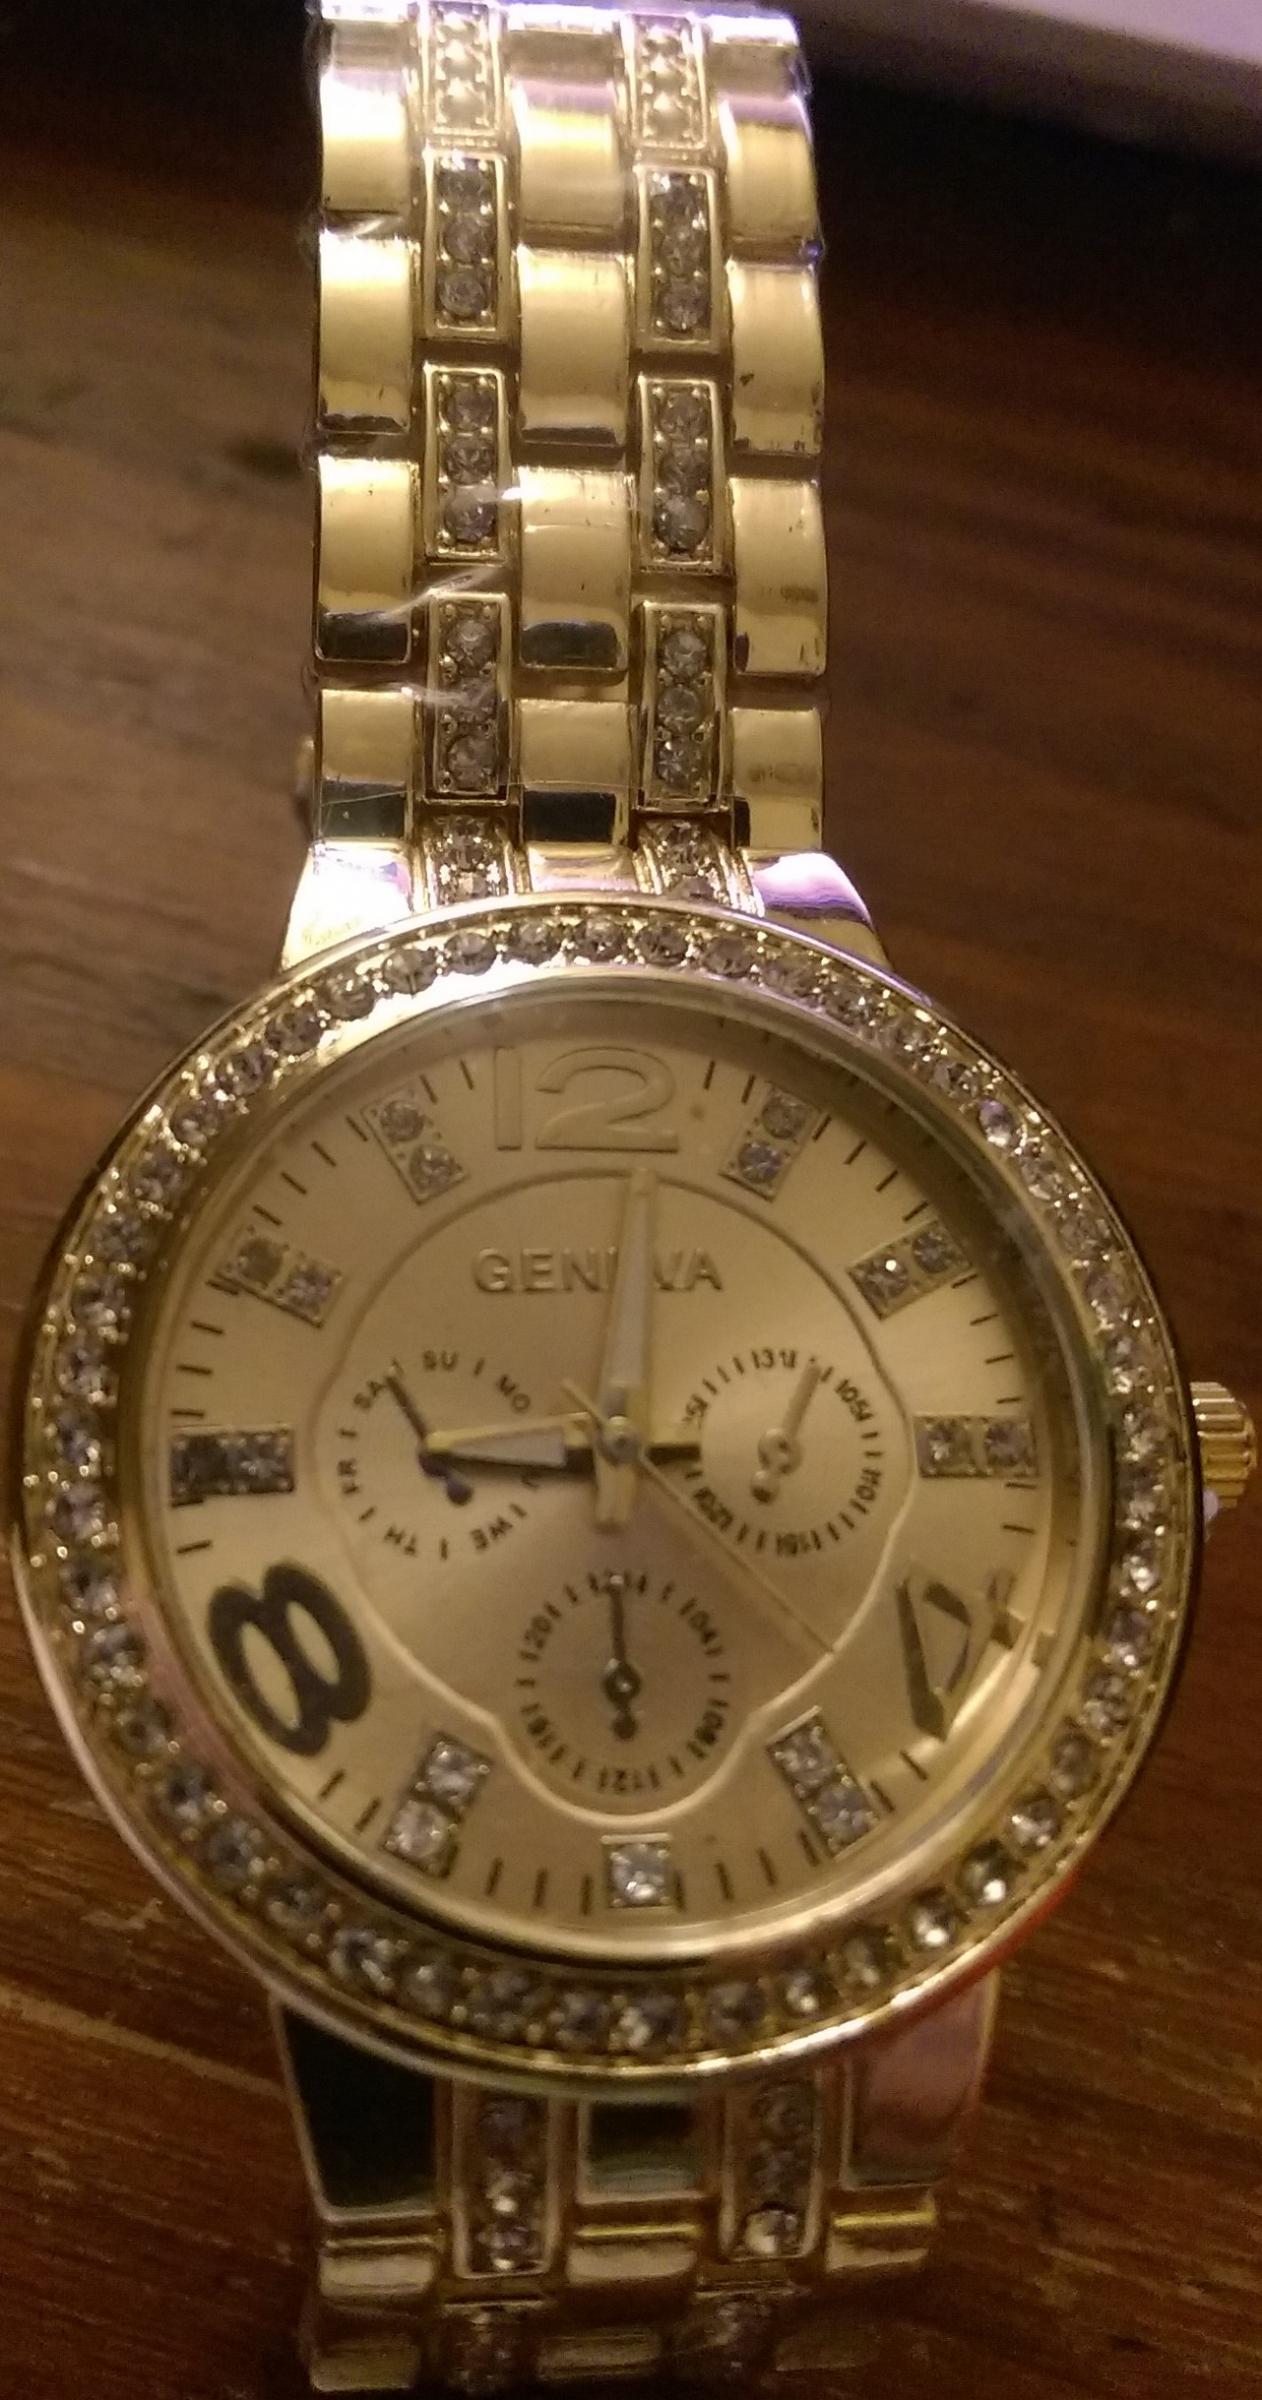 Une montre dorée bling bling